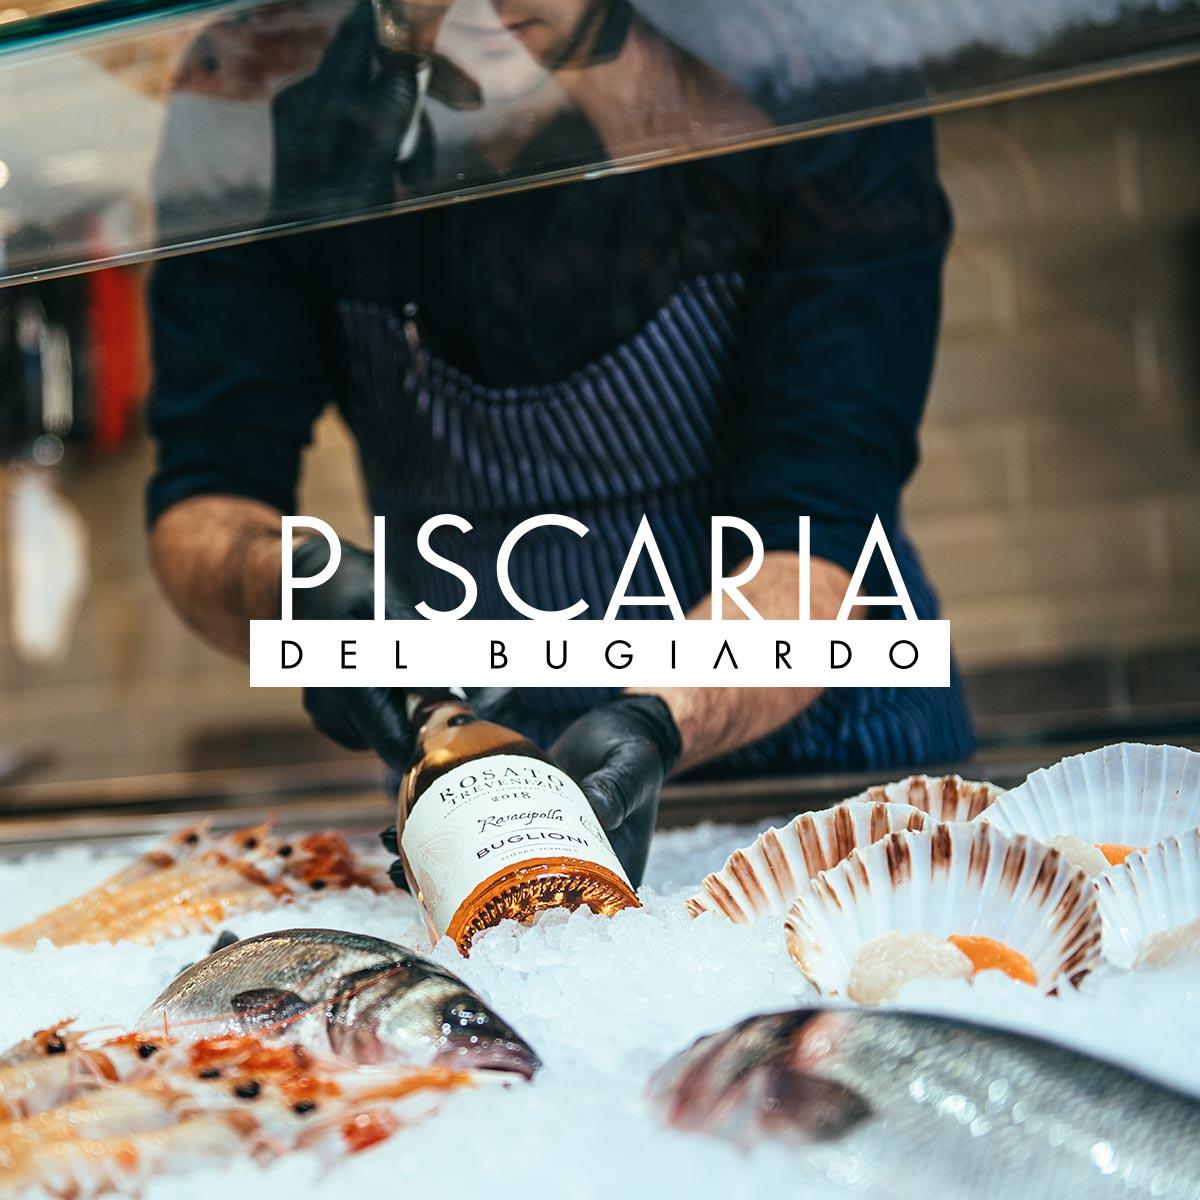 Pranzo in Piscaria